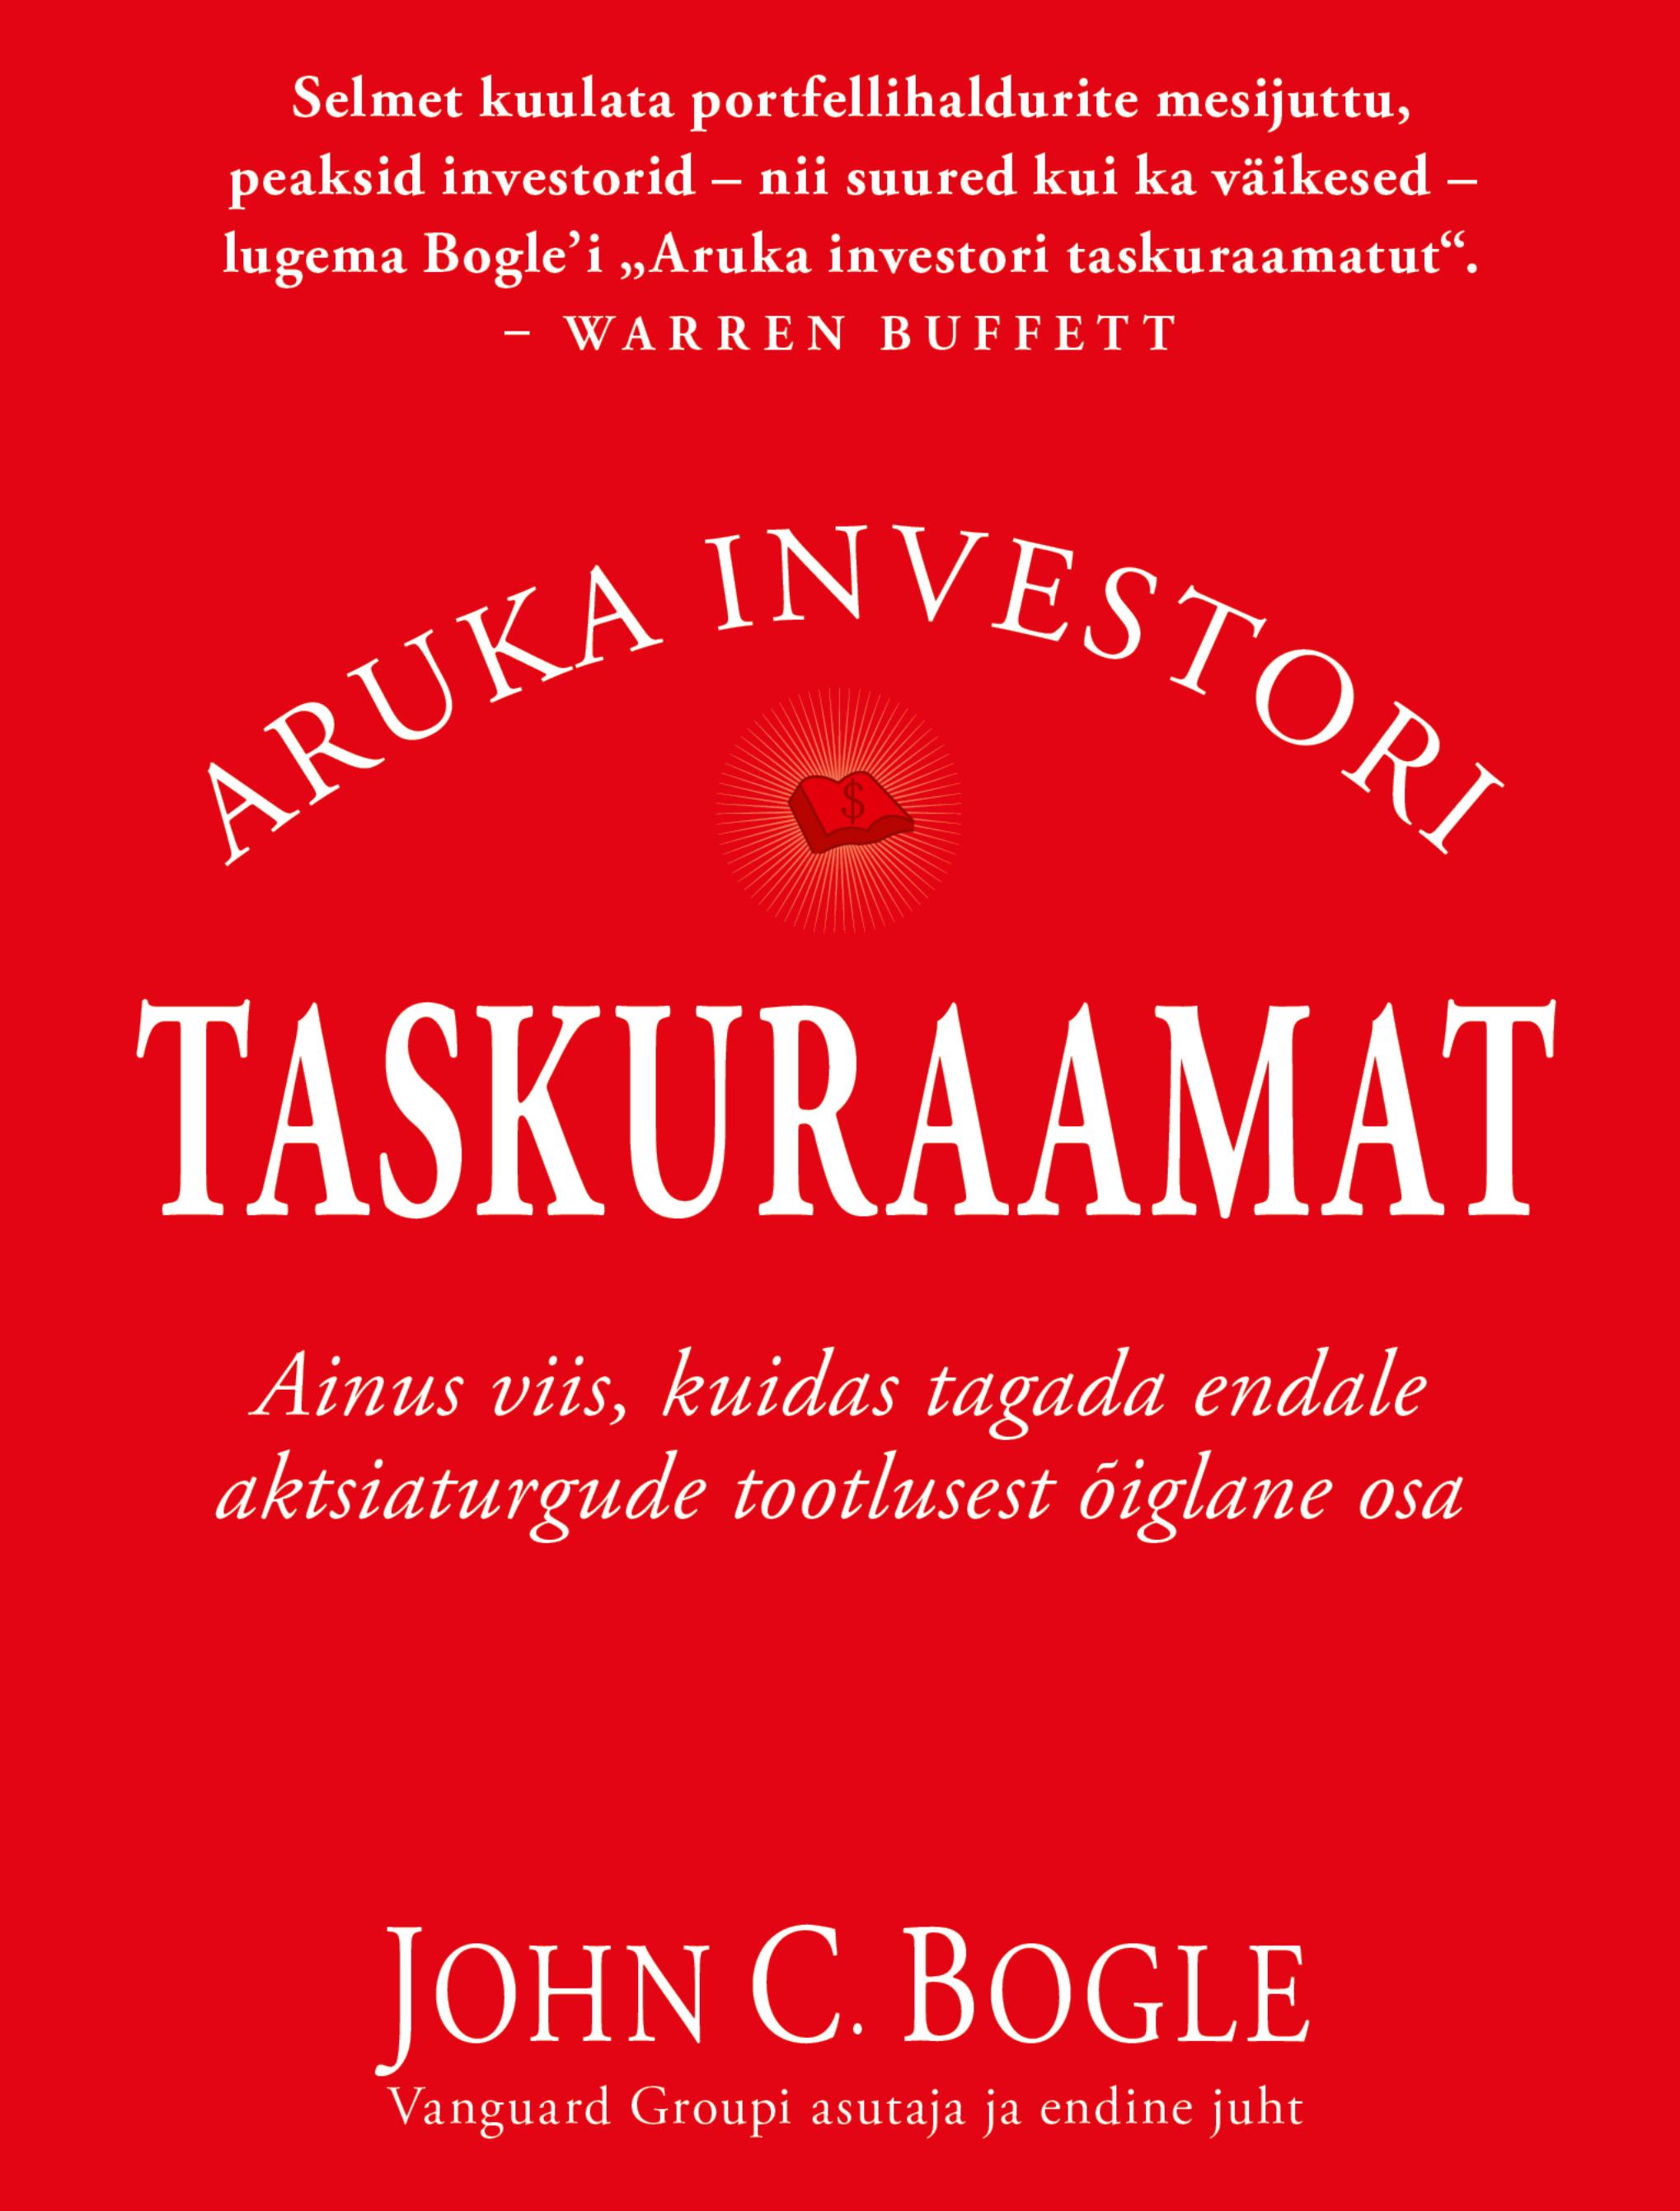 Купить книгу Aruka investori taskuraamat, автора John C. Bogle